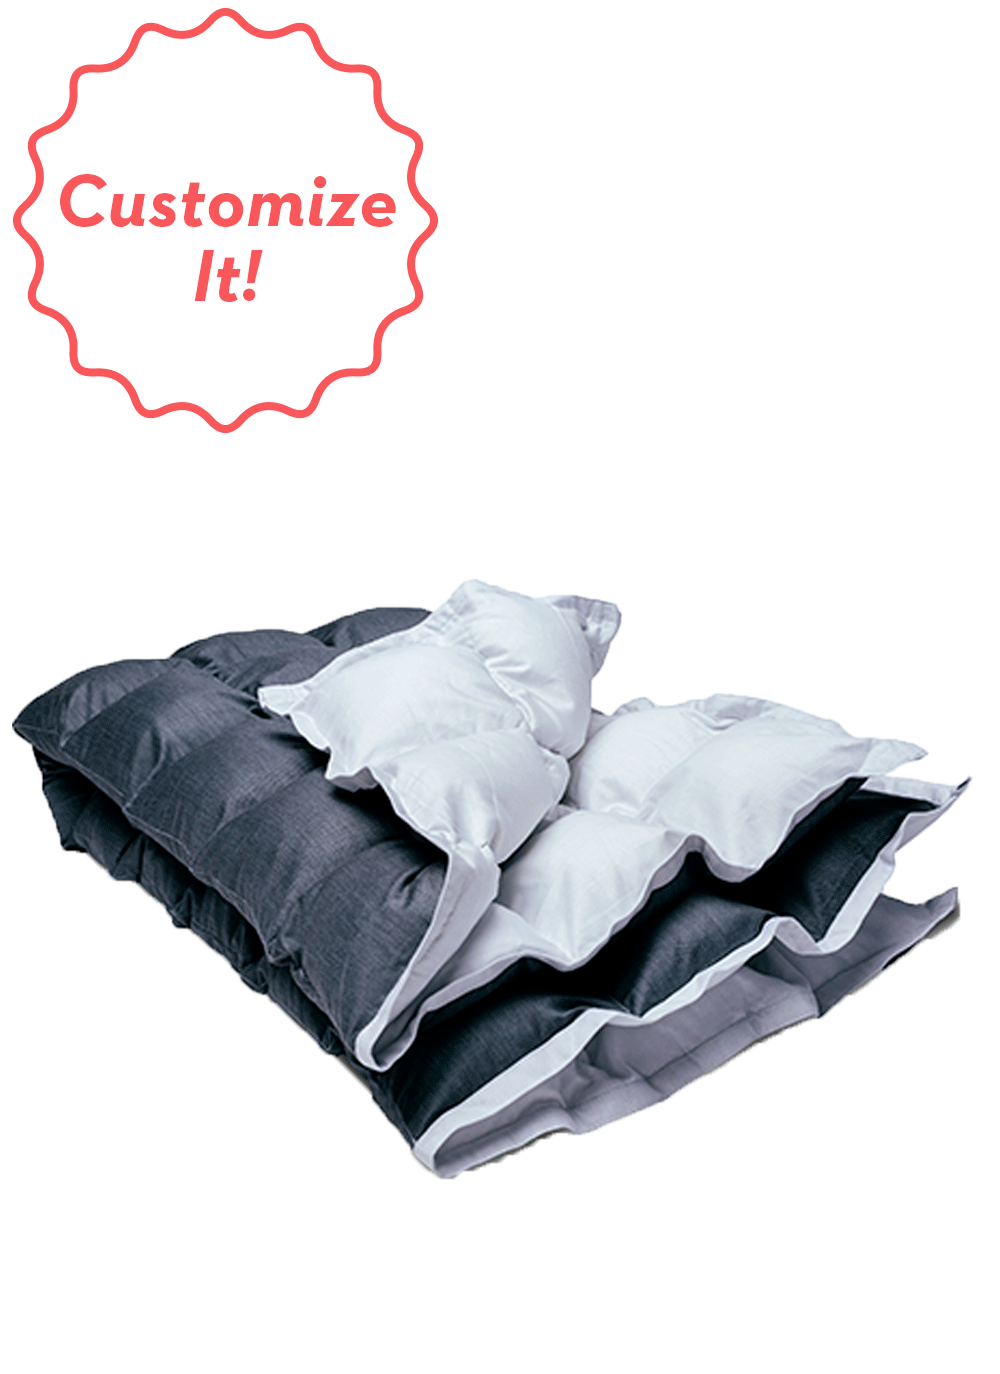 Custom Weighted Blanket Weighted Blanket Best Weighted Blanket Blanket